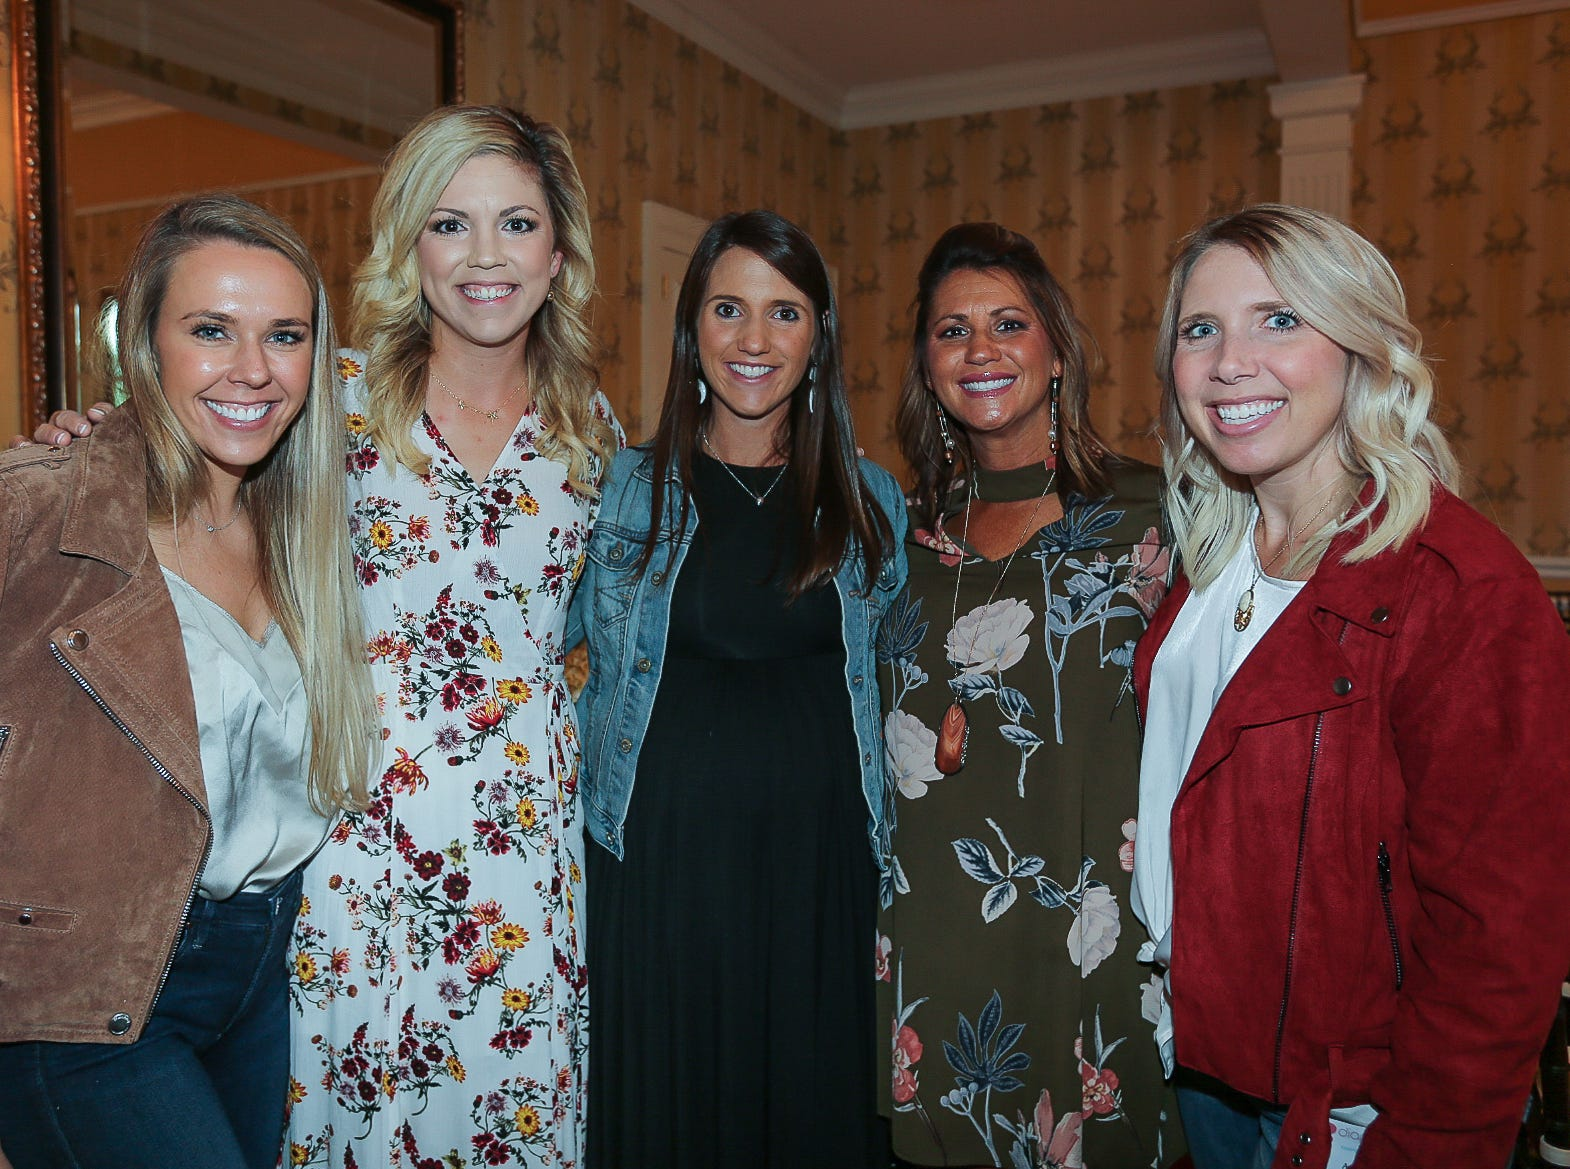 Annie Farris, Ashley O'Sullivan, Katie Riley, Lindsey Sadler, and Amy Henson